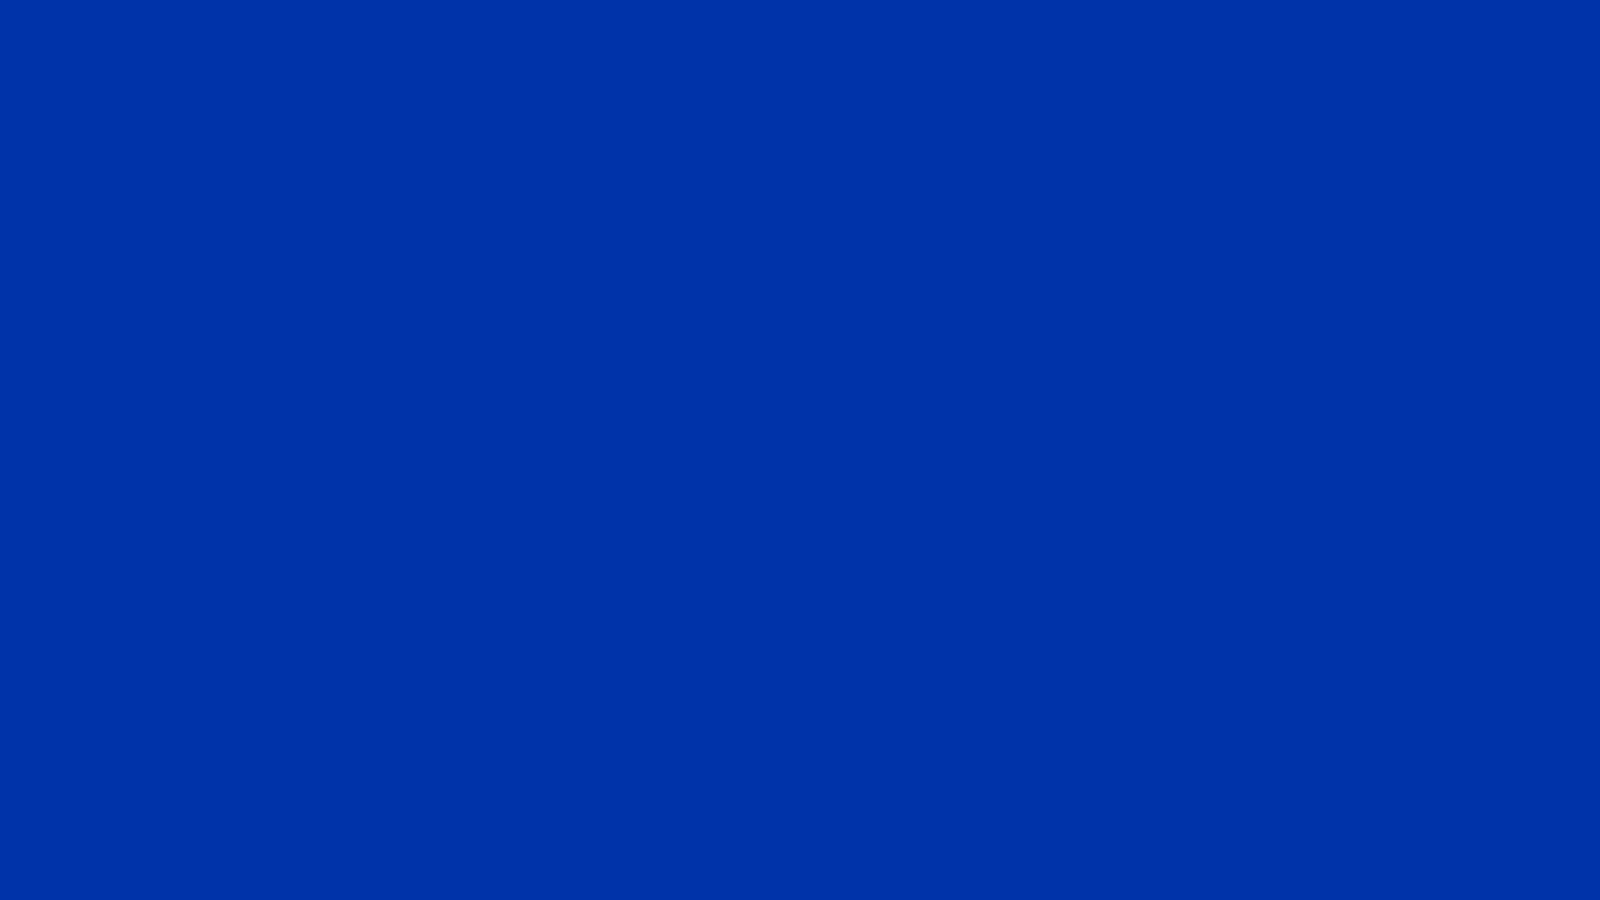 1600x900 UA Blue Solid Color Background